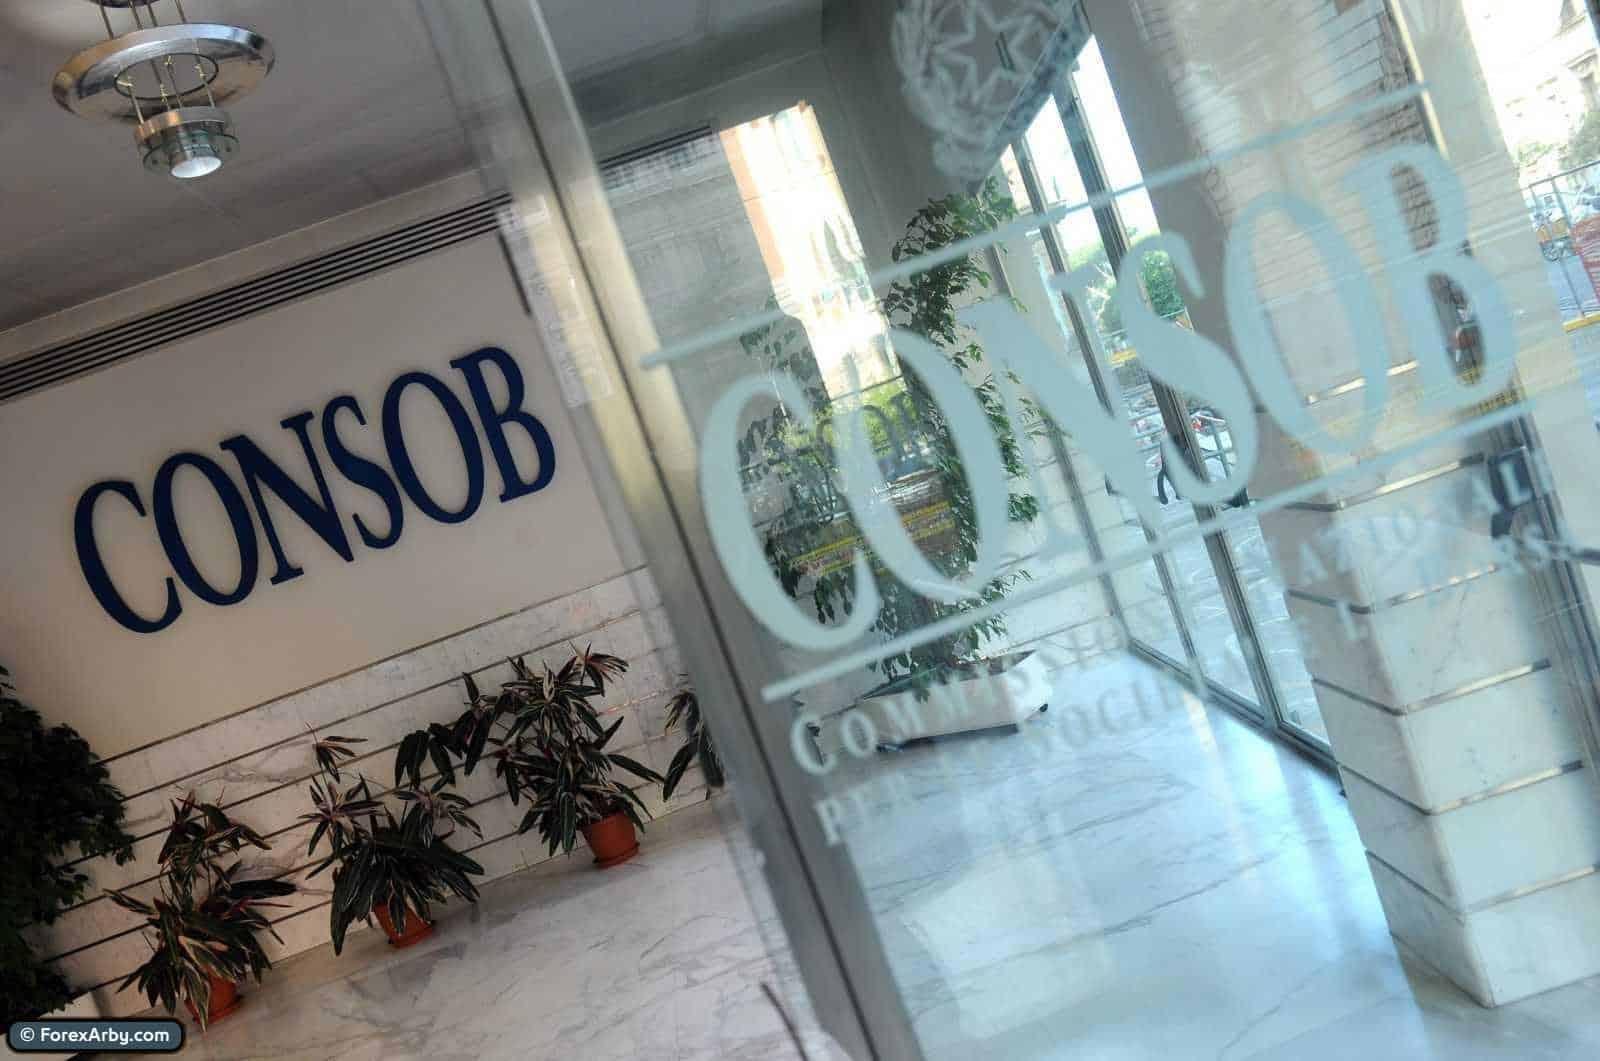 CONSOB - CONSOB تحظر 6 شركات وساطة أخري ليصل العدد الي 94 شركة